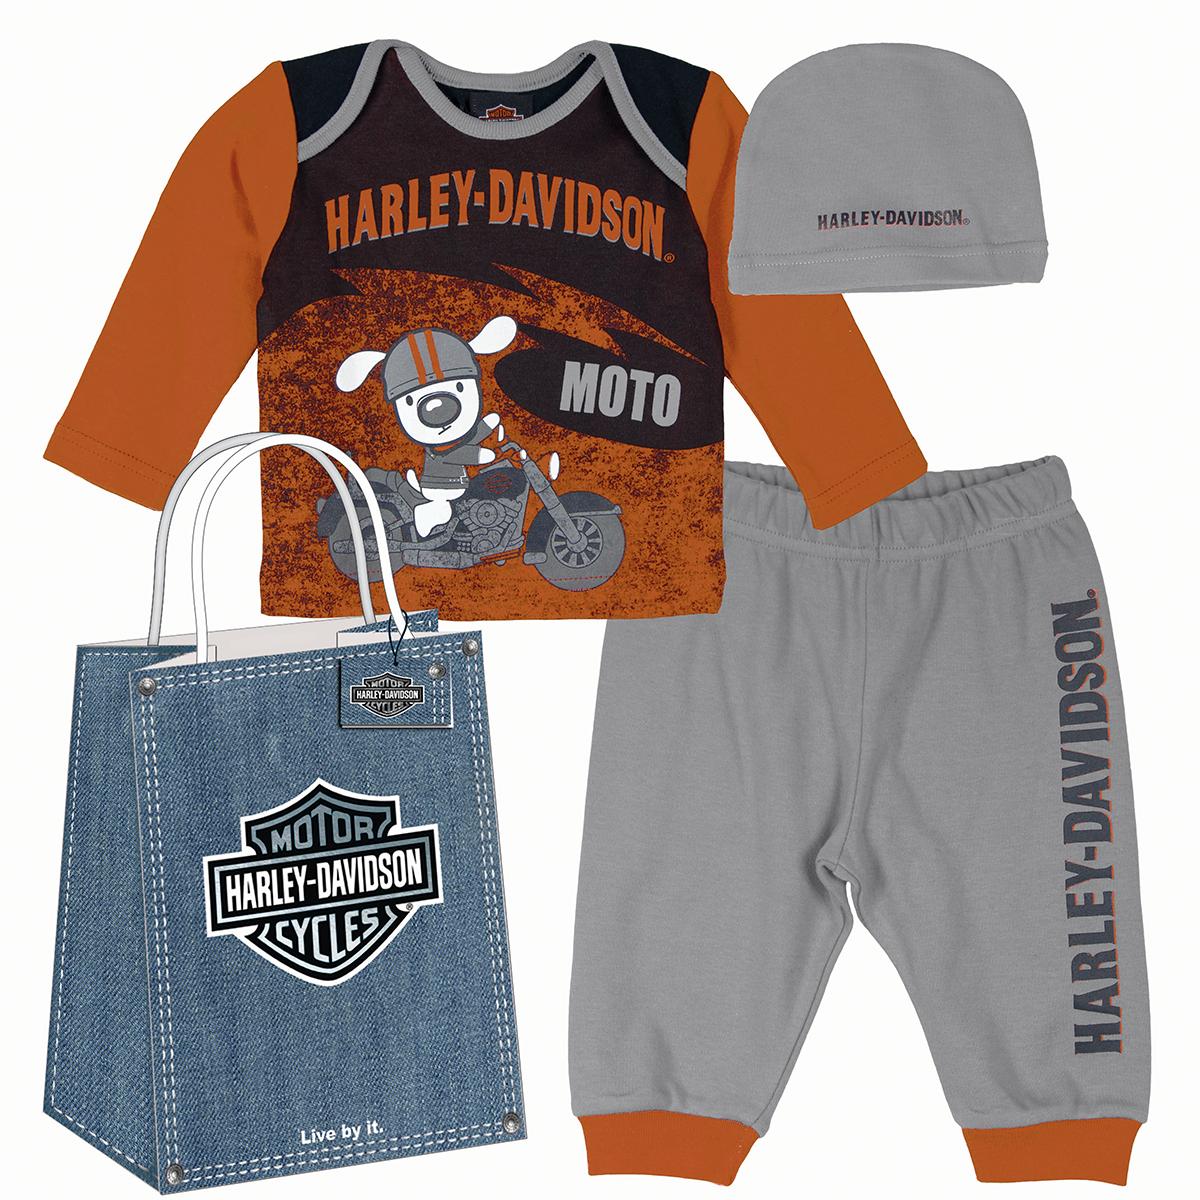 adventure harley davidson new clothes